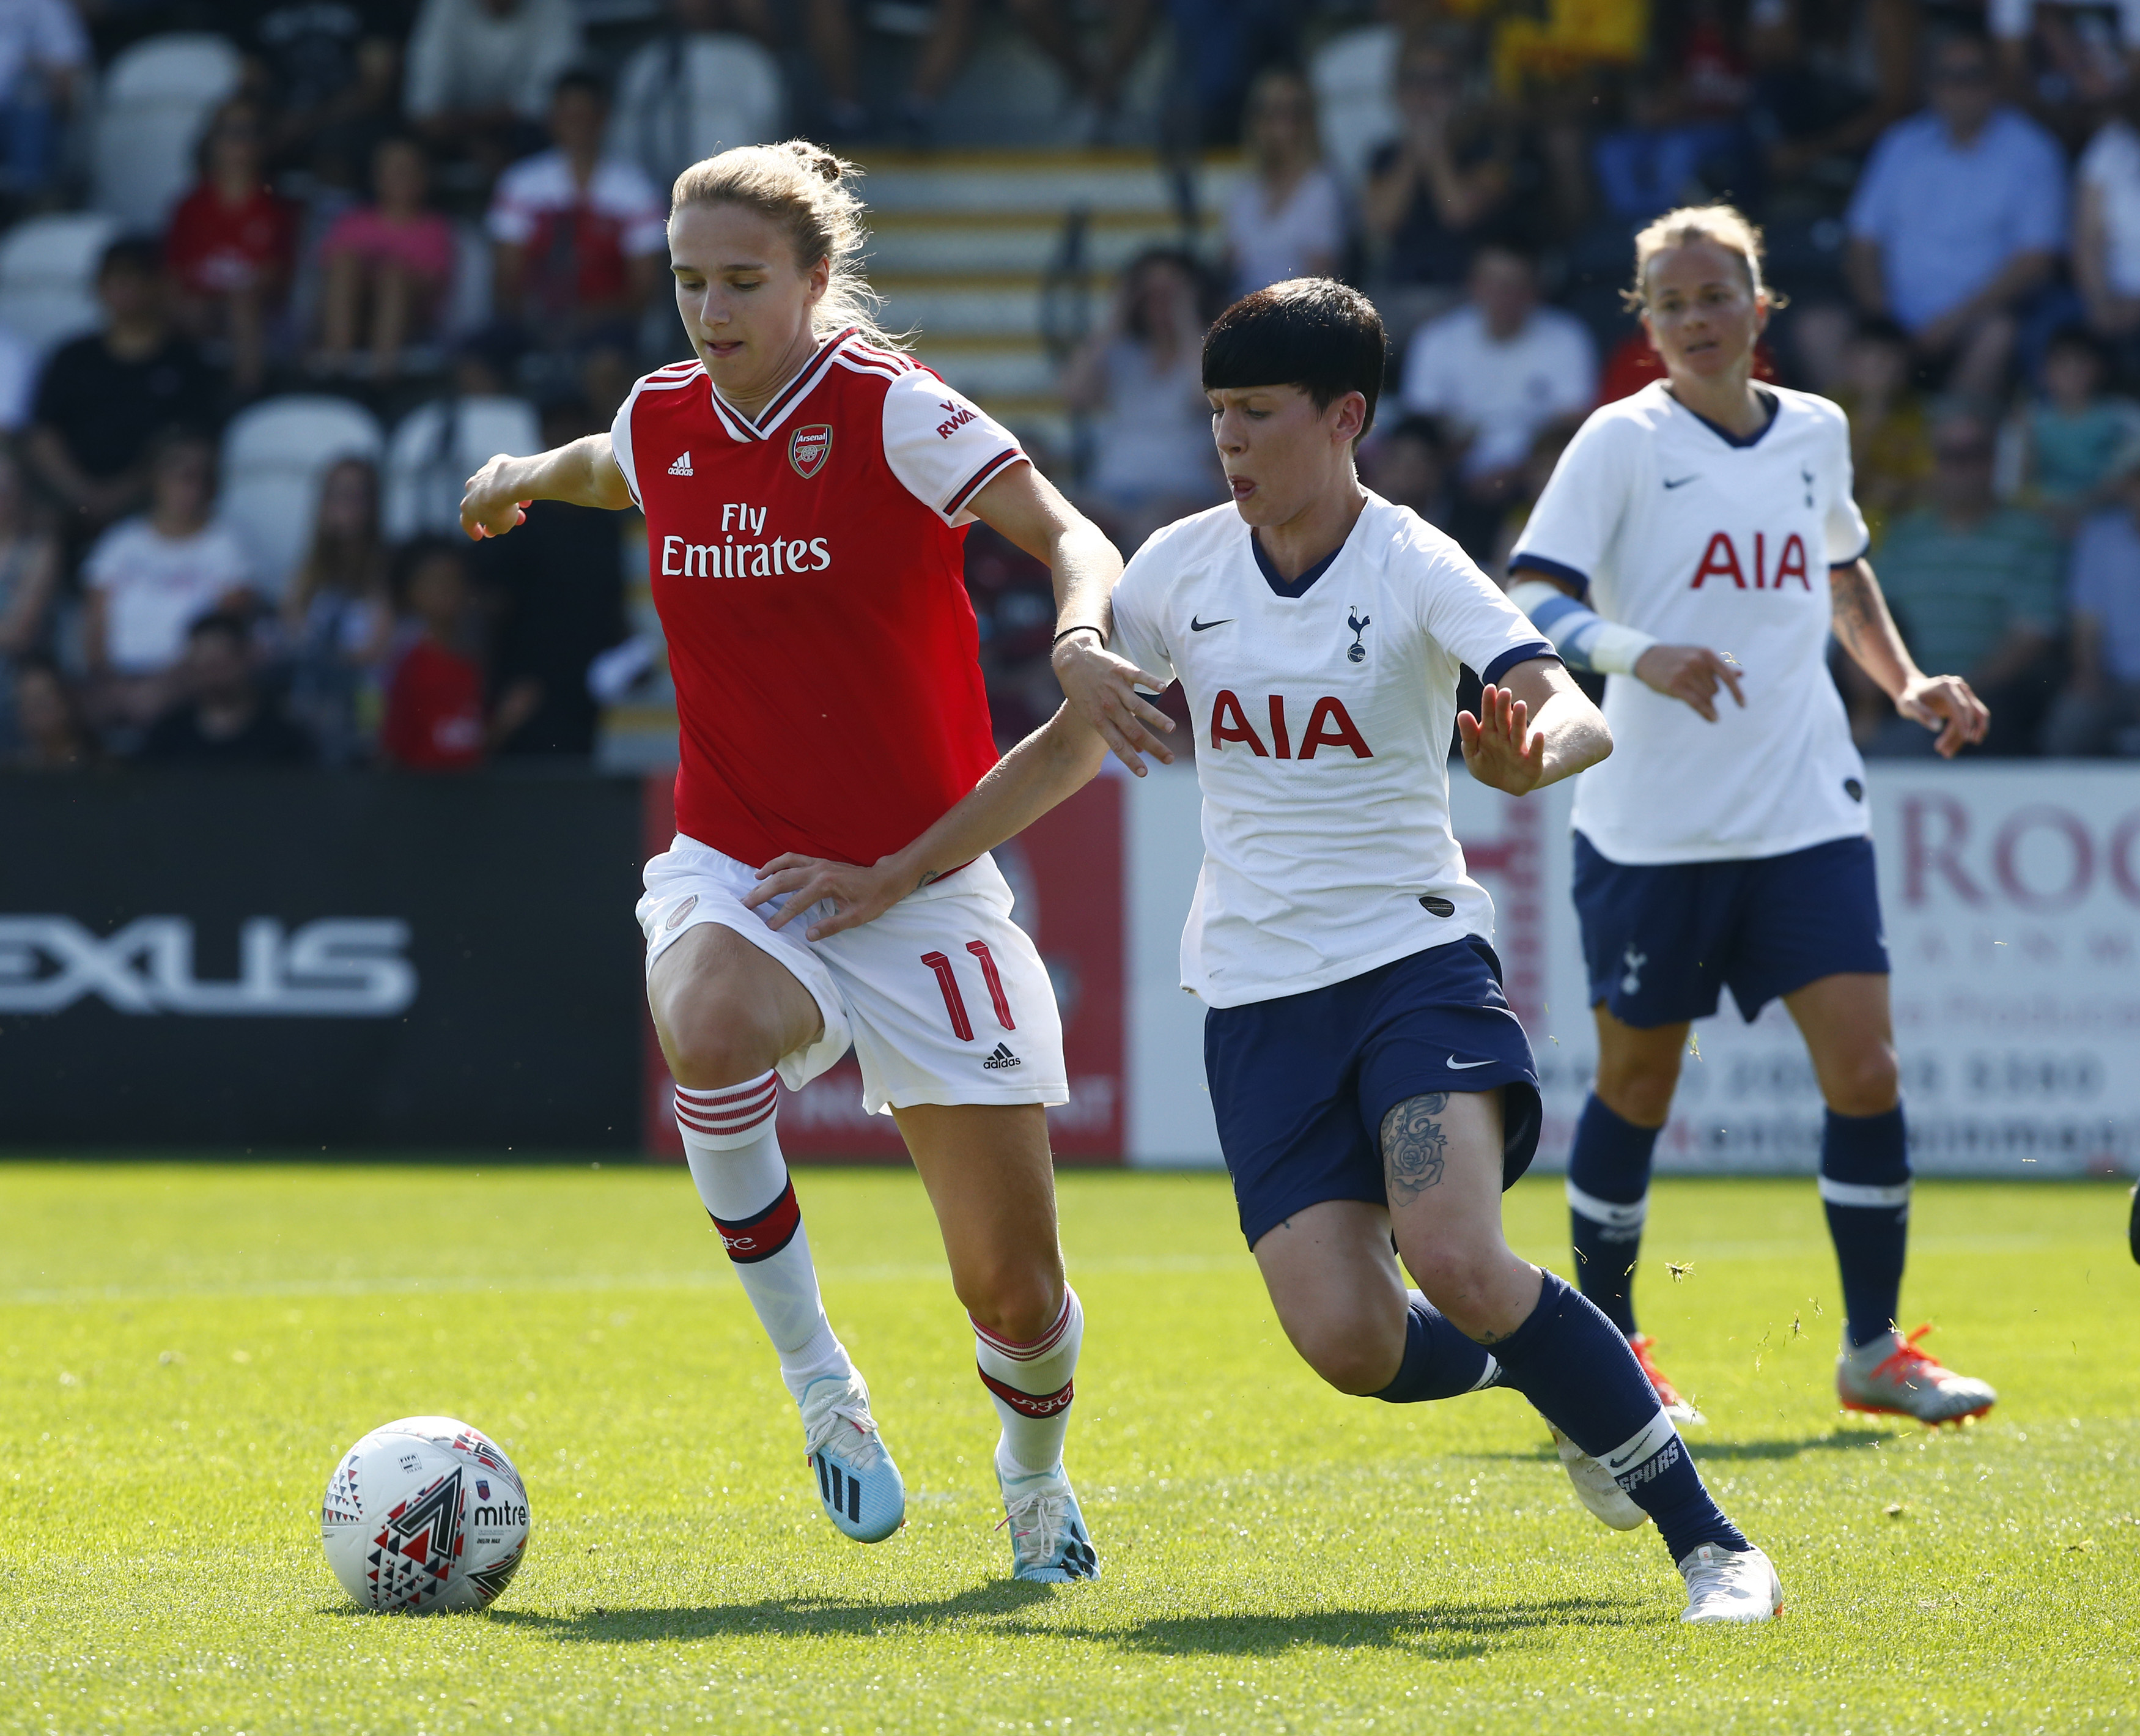 Arsenal Women v Tottenham Hotspur Women - Pre Season Friendly